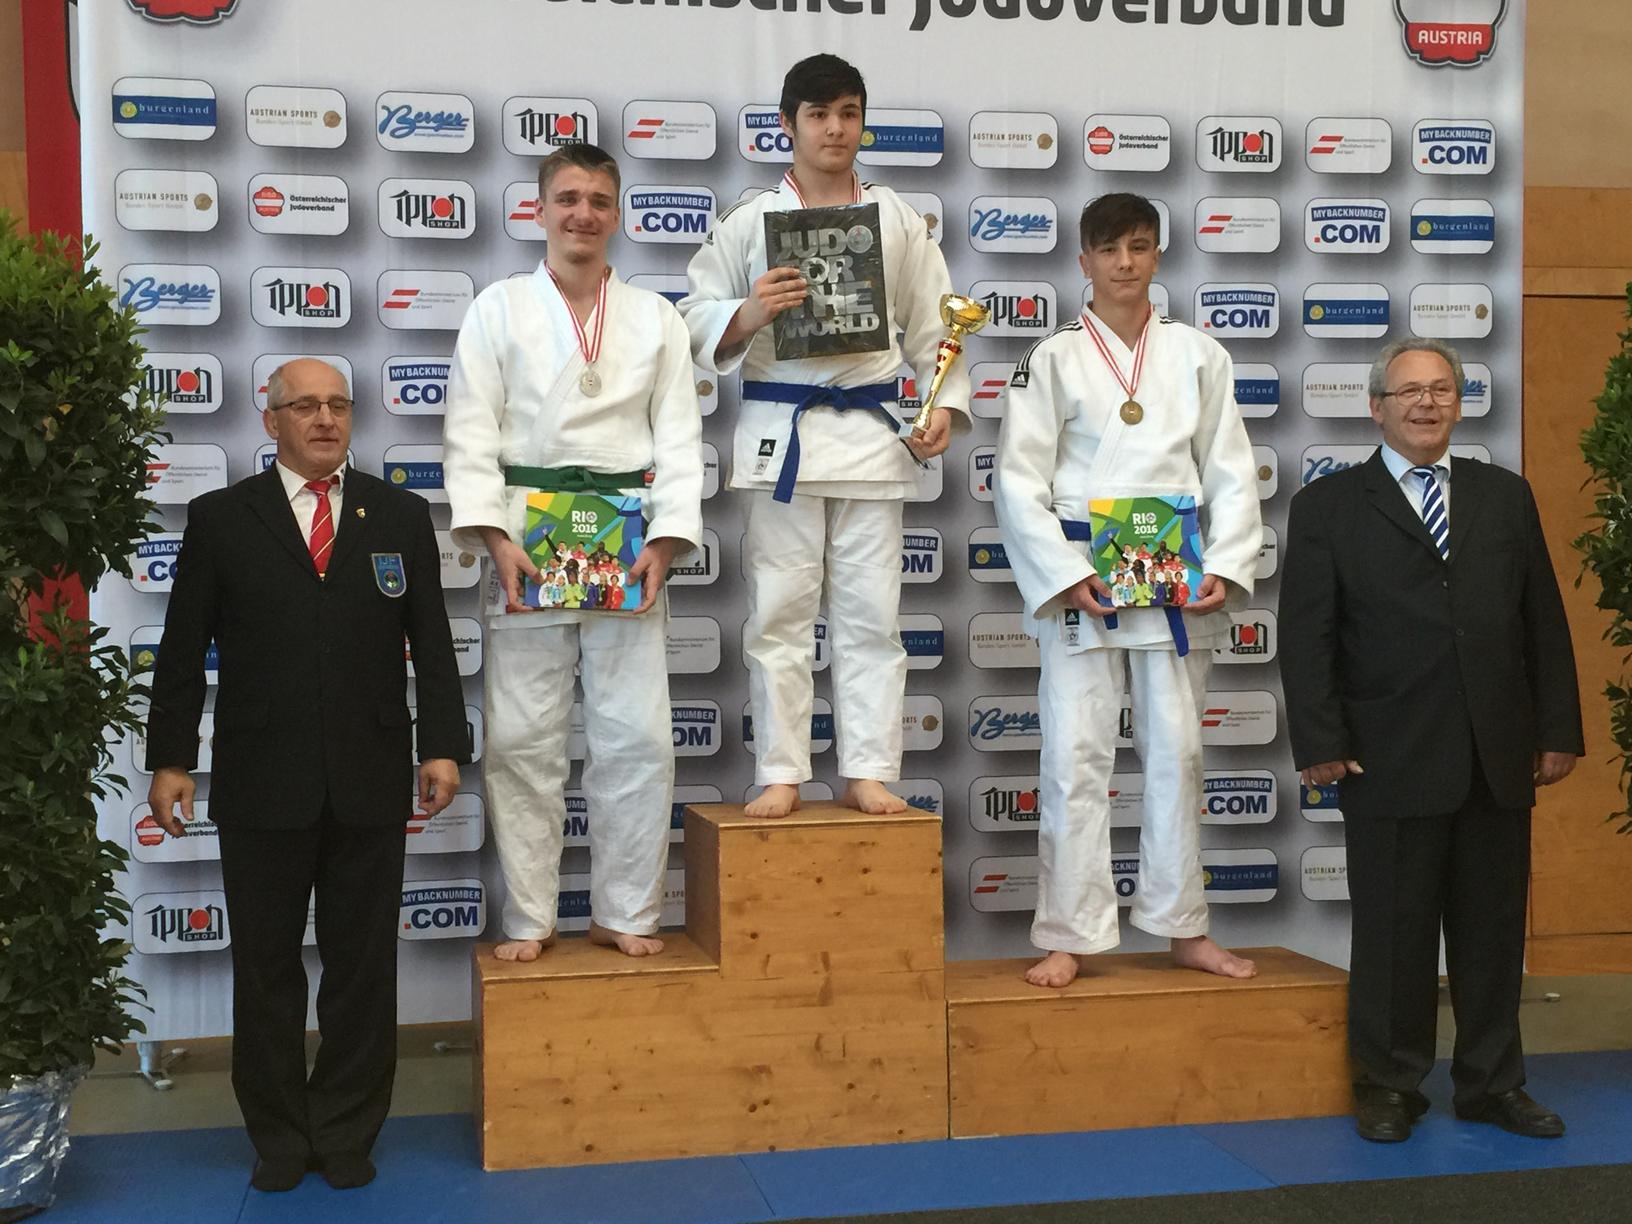 Bronzemedaille für Julian Riedinger